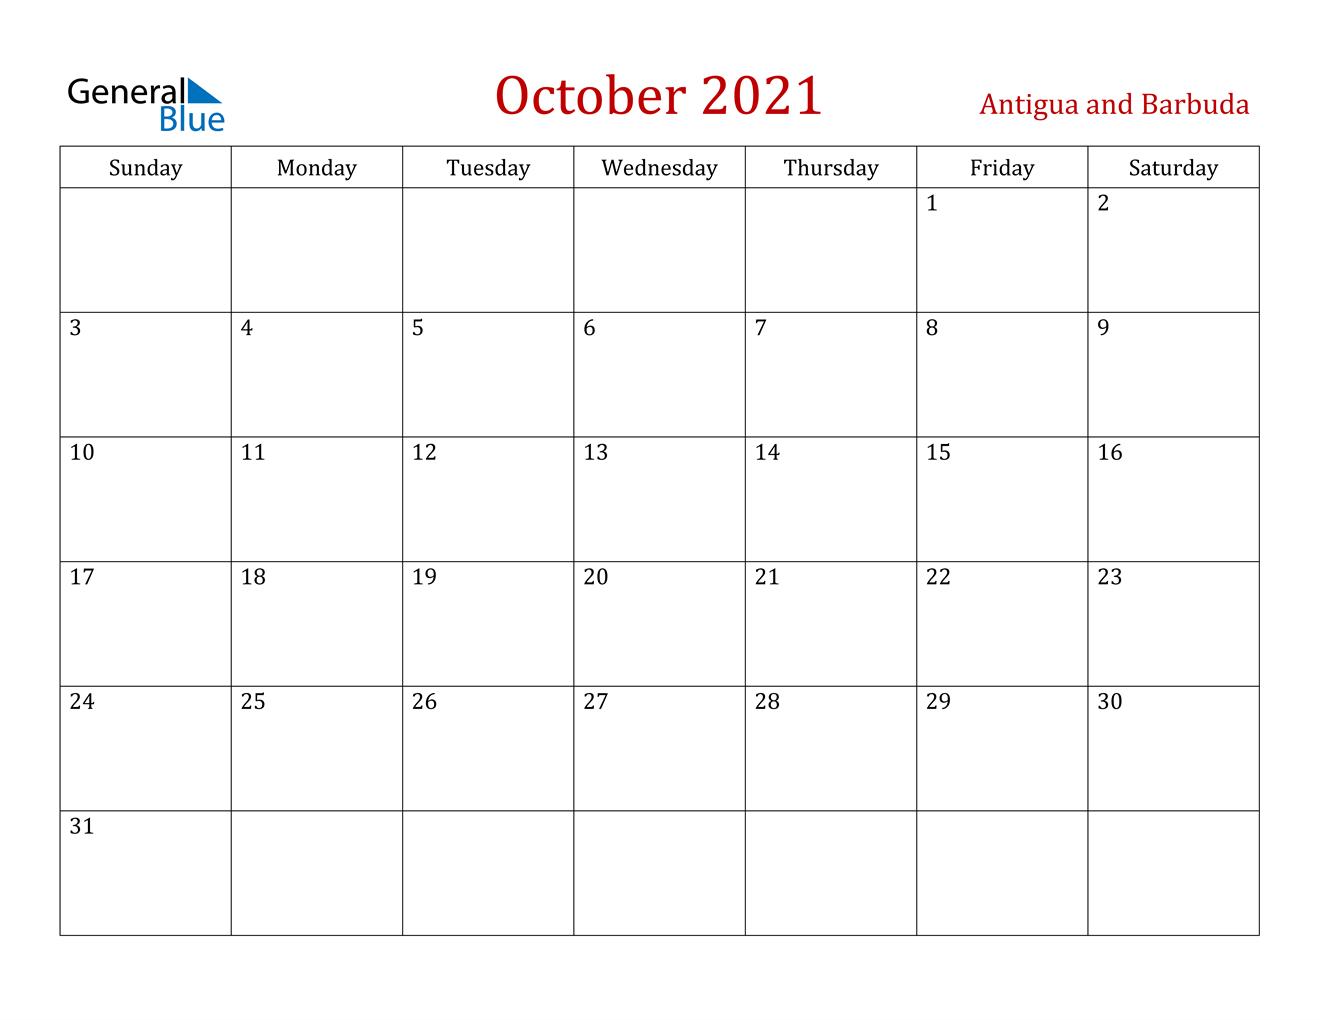 October 2021 Calendar Antigua And Barbuda